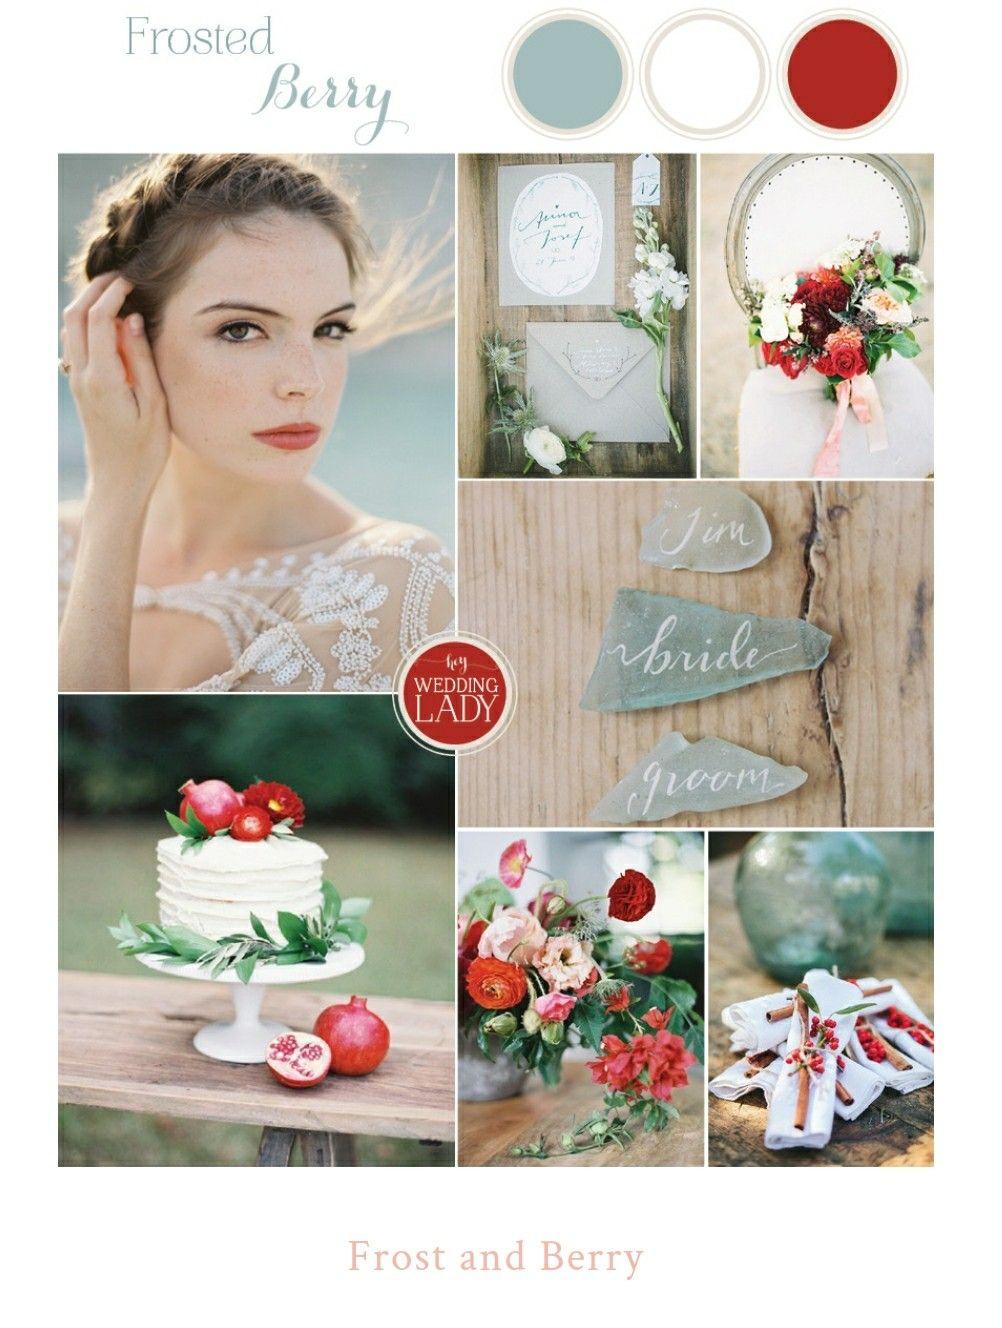 Pin by Smashley on Wedding ideas Wedding palette, June